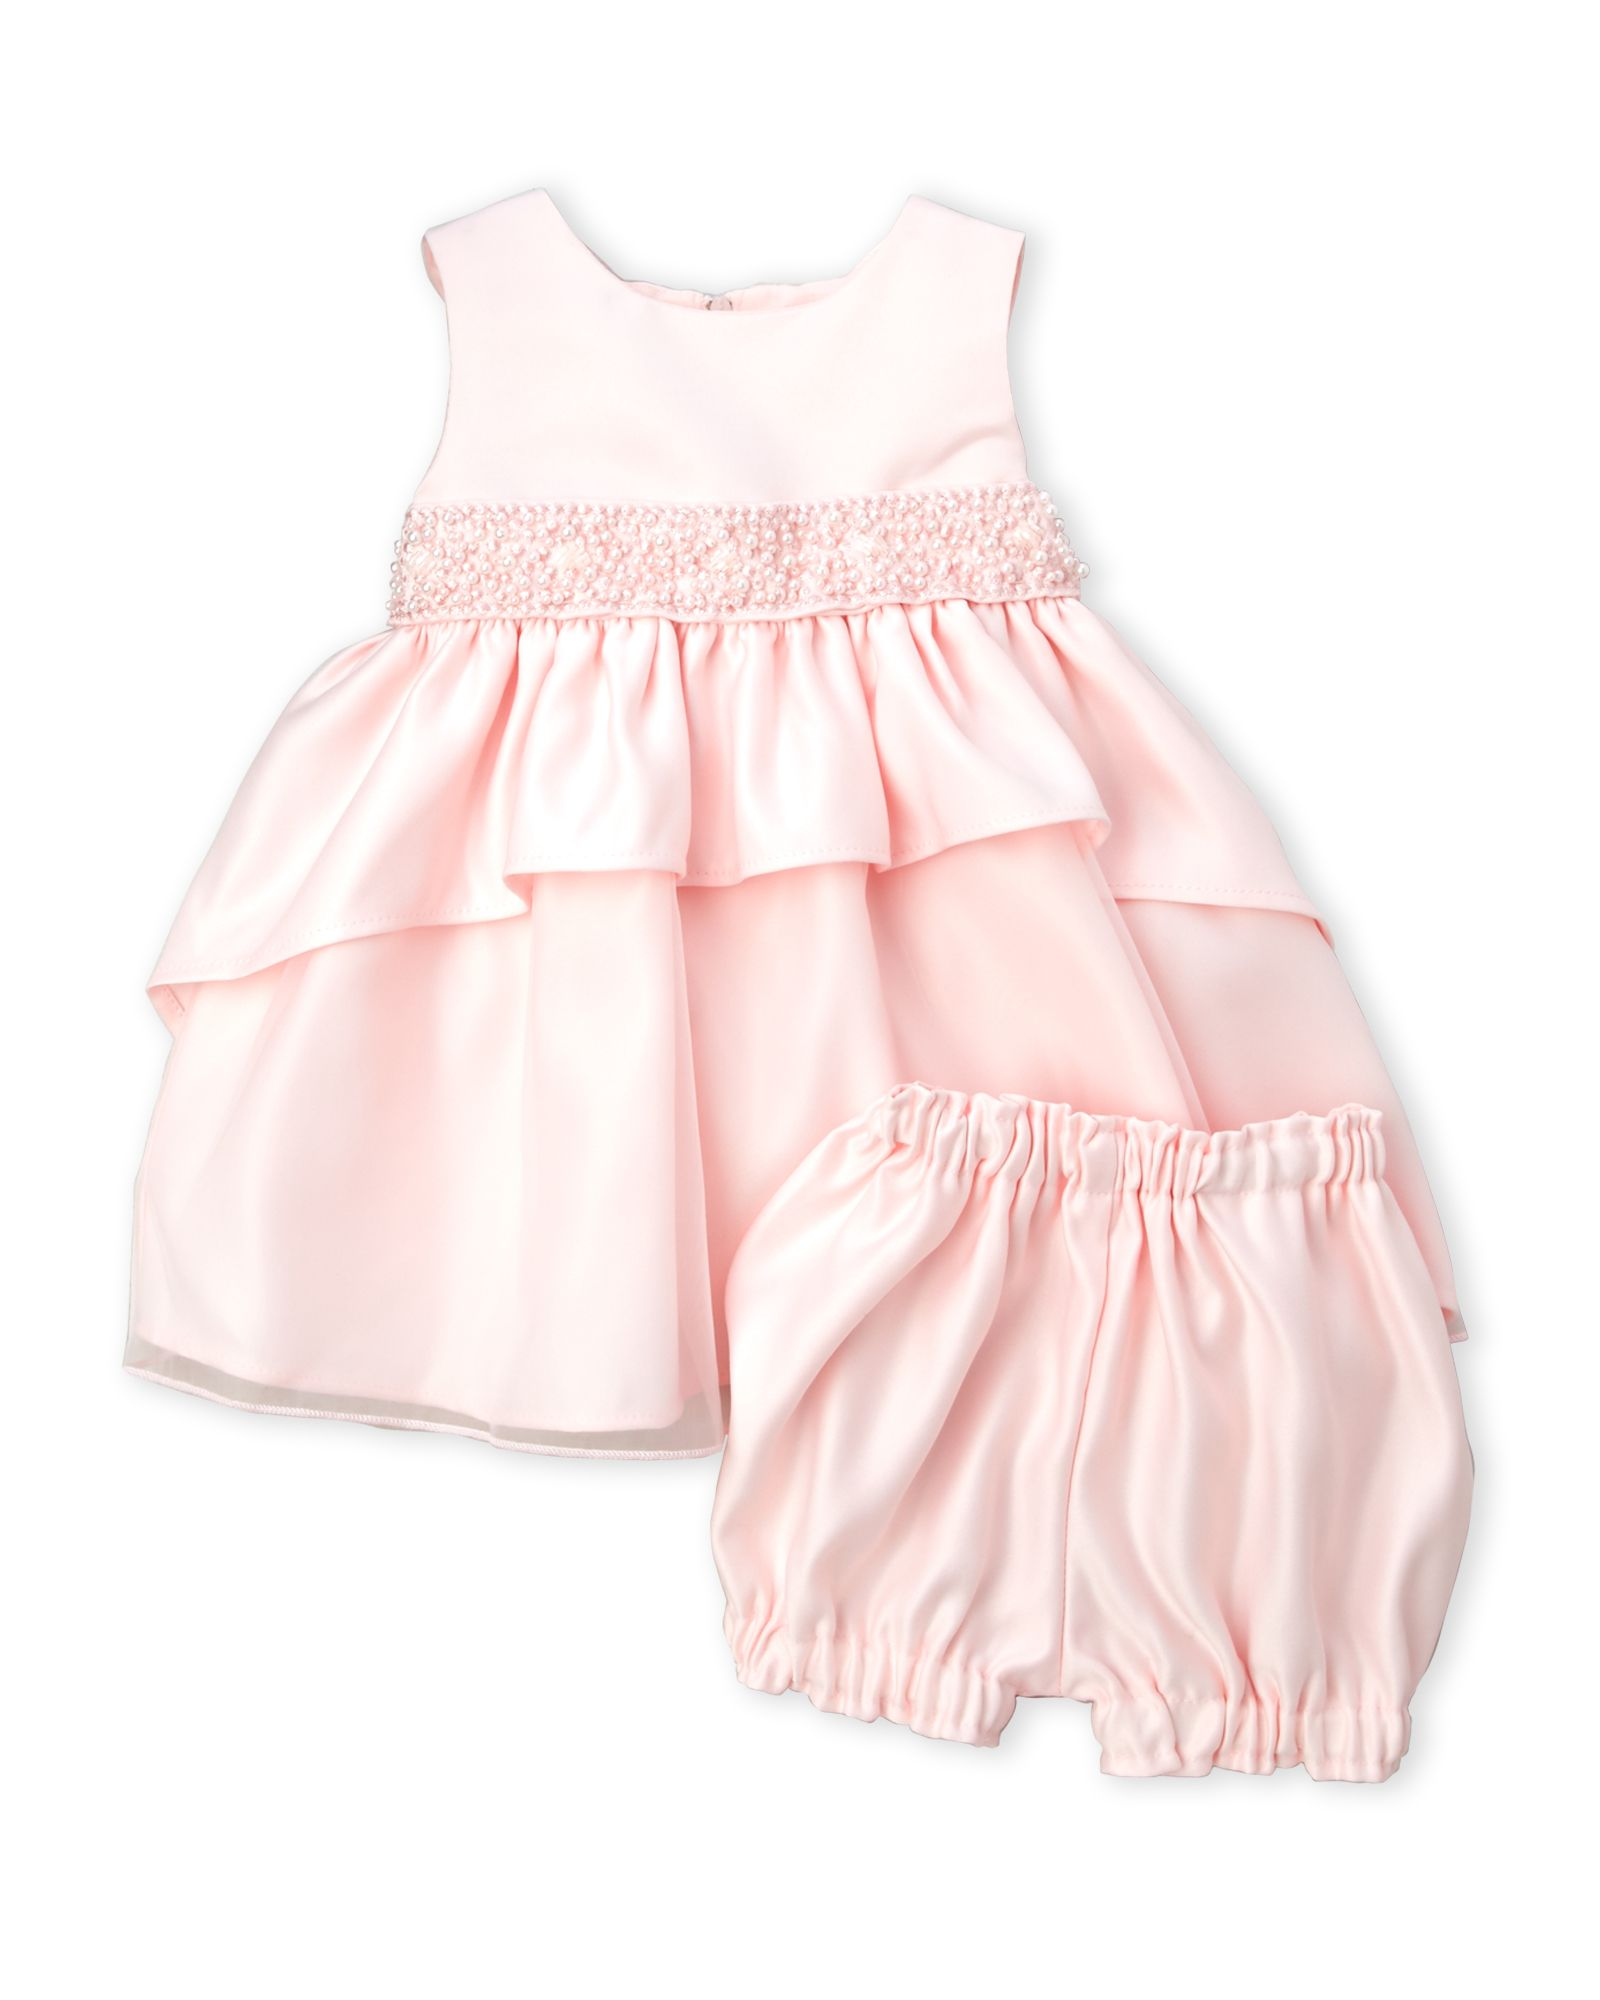 38adbf5f1 Princess Faith (Infant Girls) Beaded Belt Gown | *Apparel ...